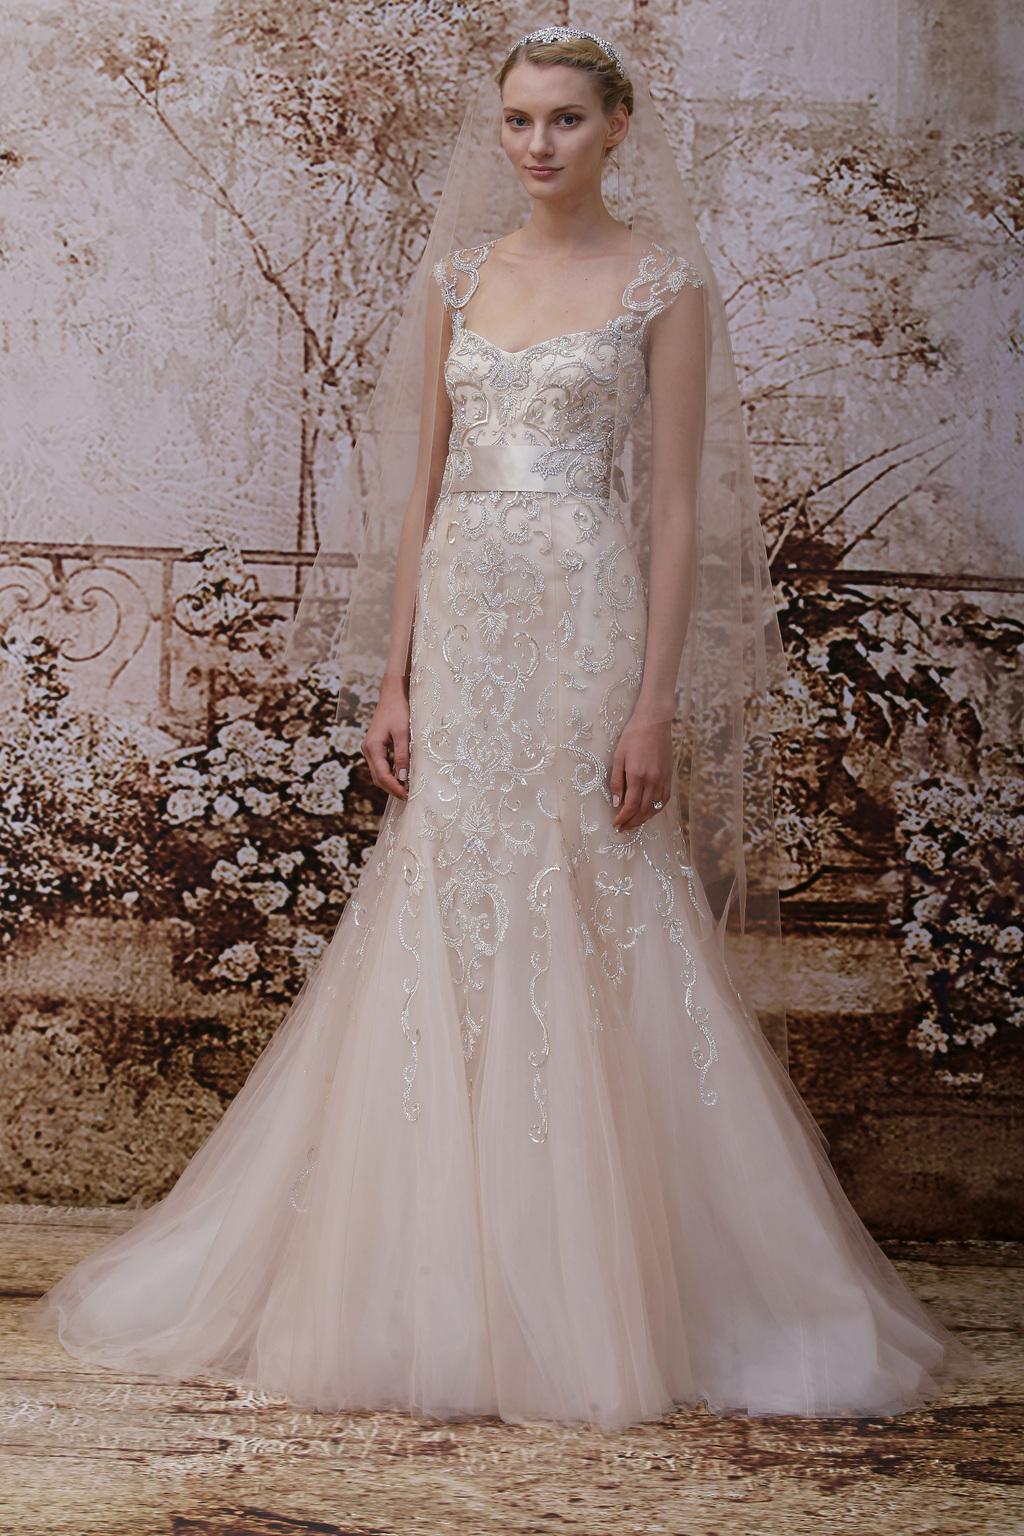 Monique-lhuillier-fall-2014-wedding-dress-look-27.full